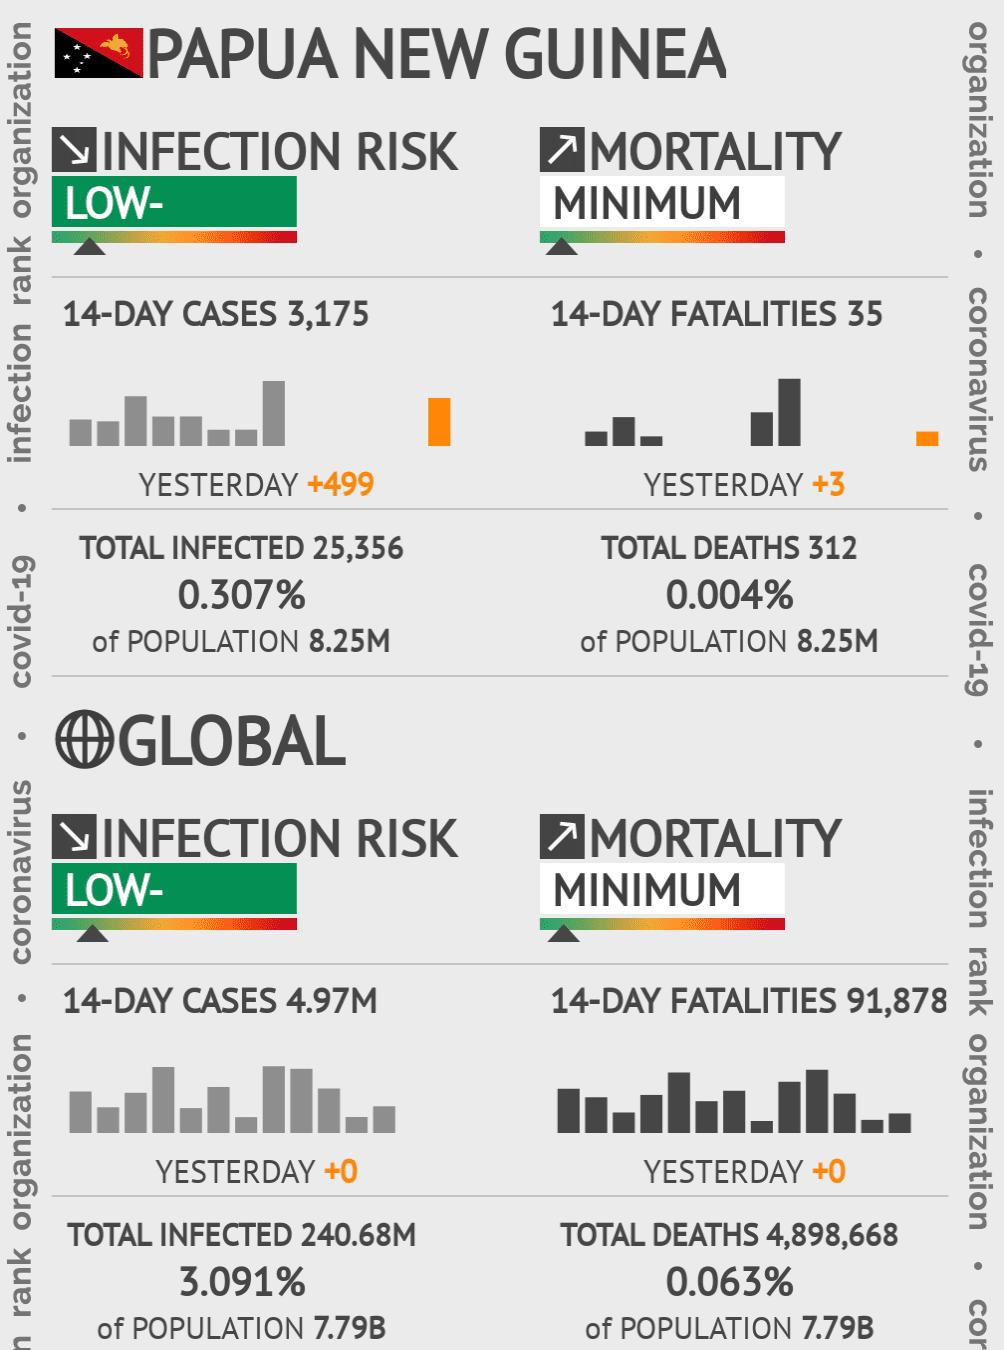 Papua New Guinea Coronavirus Covid-19 Risk of Infection on October 18, 2020